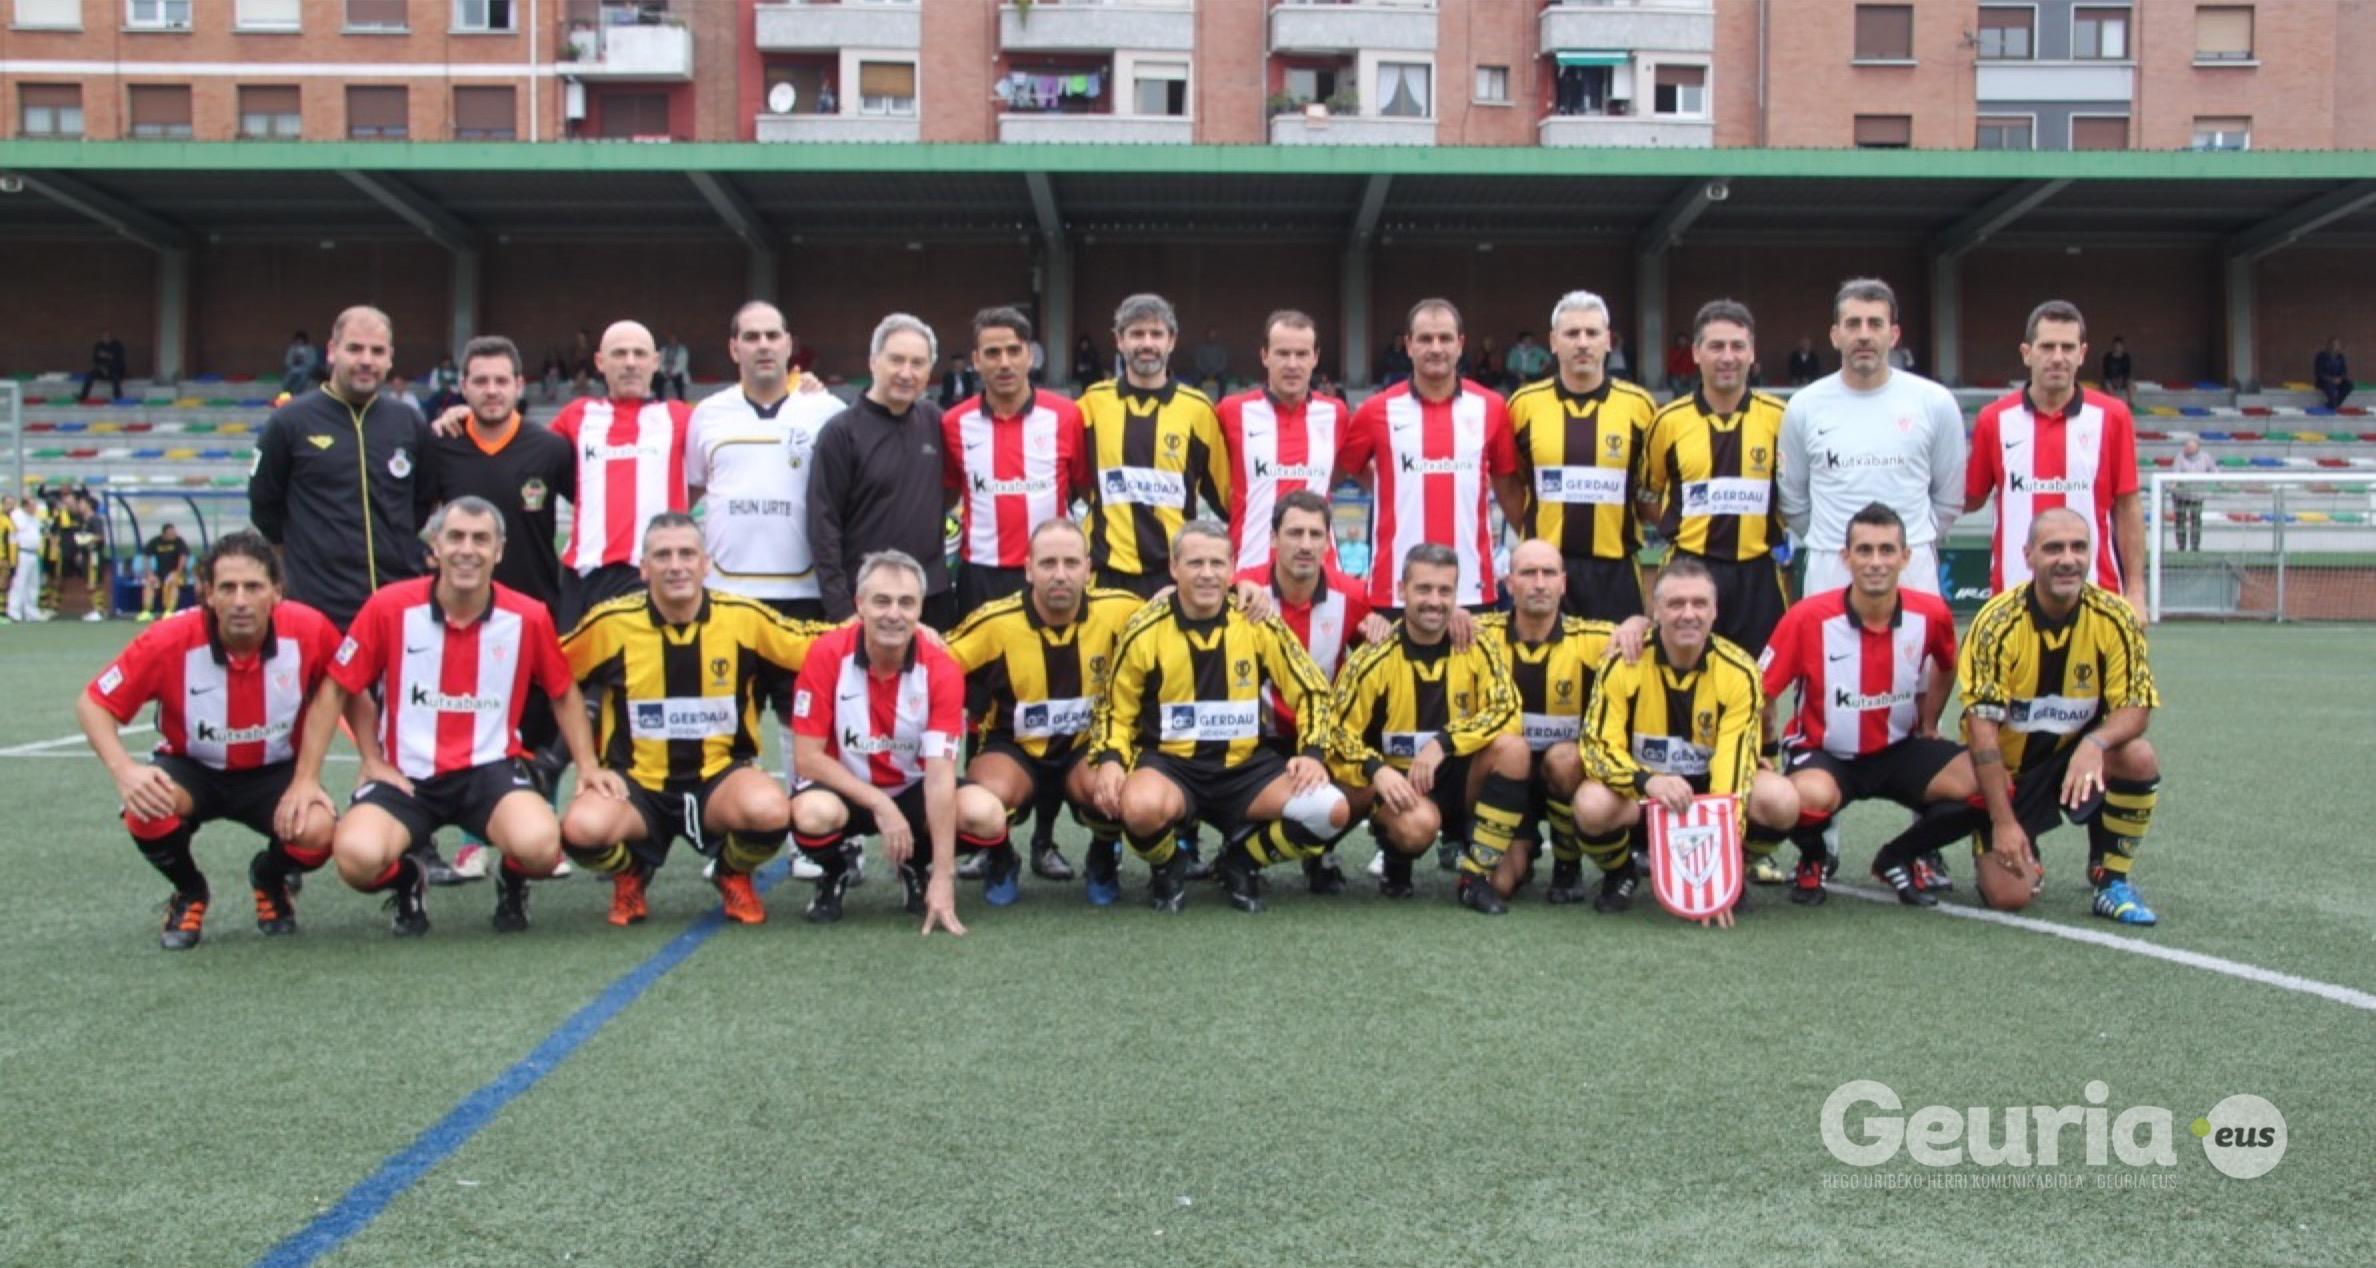 basauri_san_fausto_2015_futbol_basconia_beteranoak_3